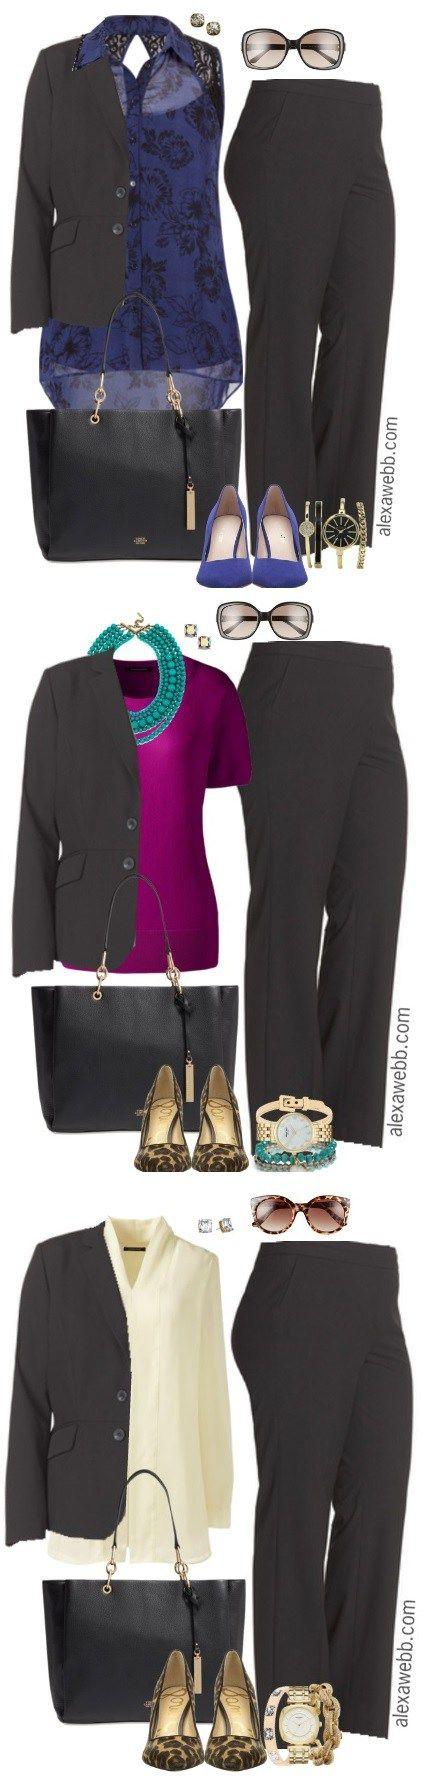 Plus Size Professional Looks - Alexa Webb